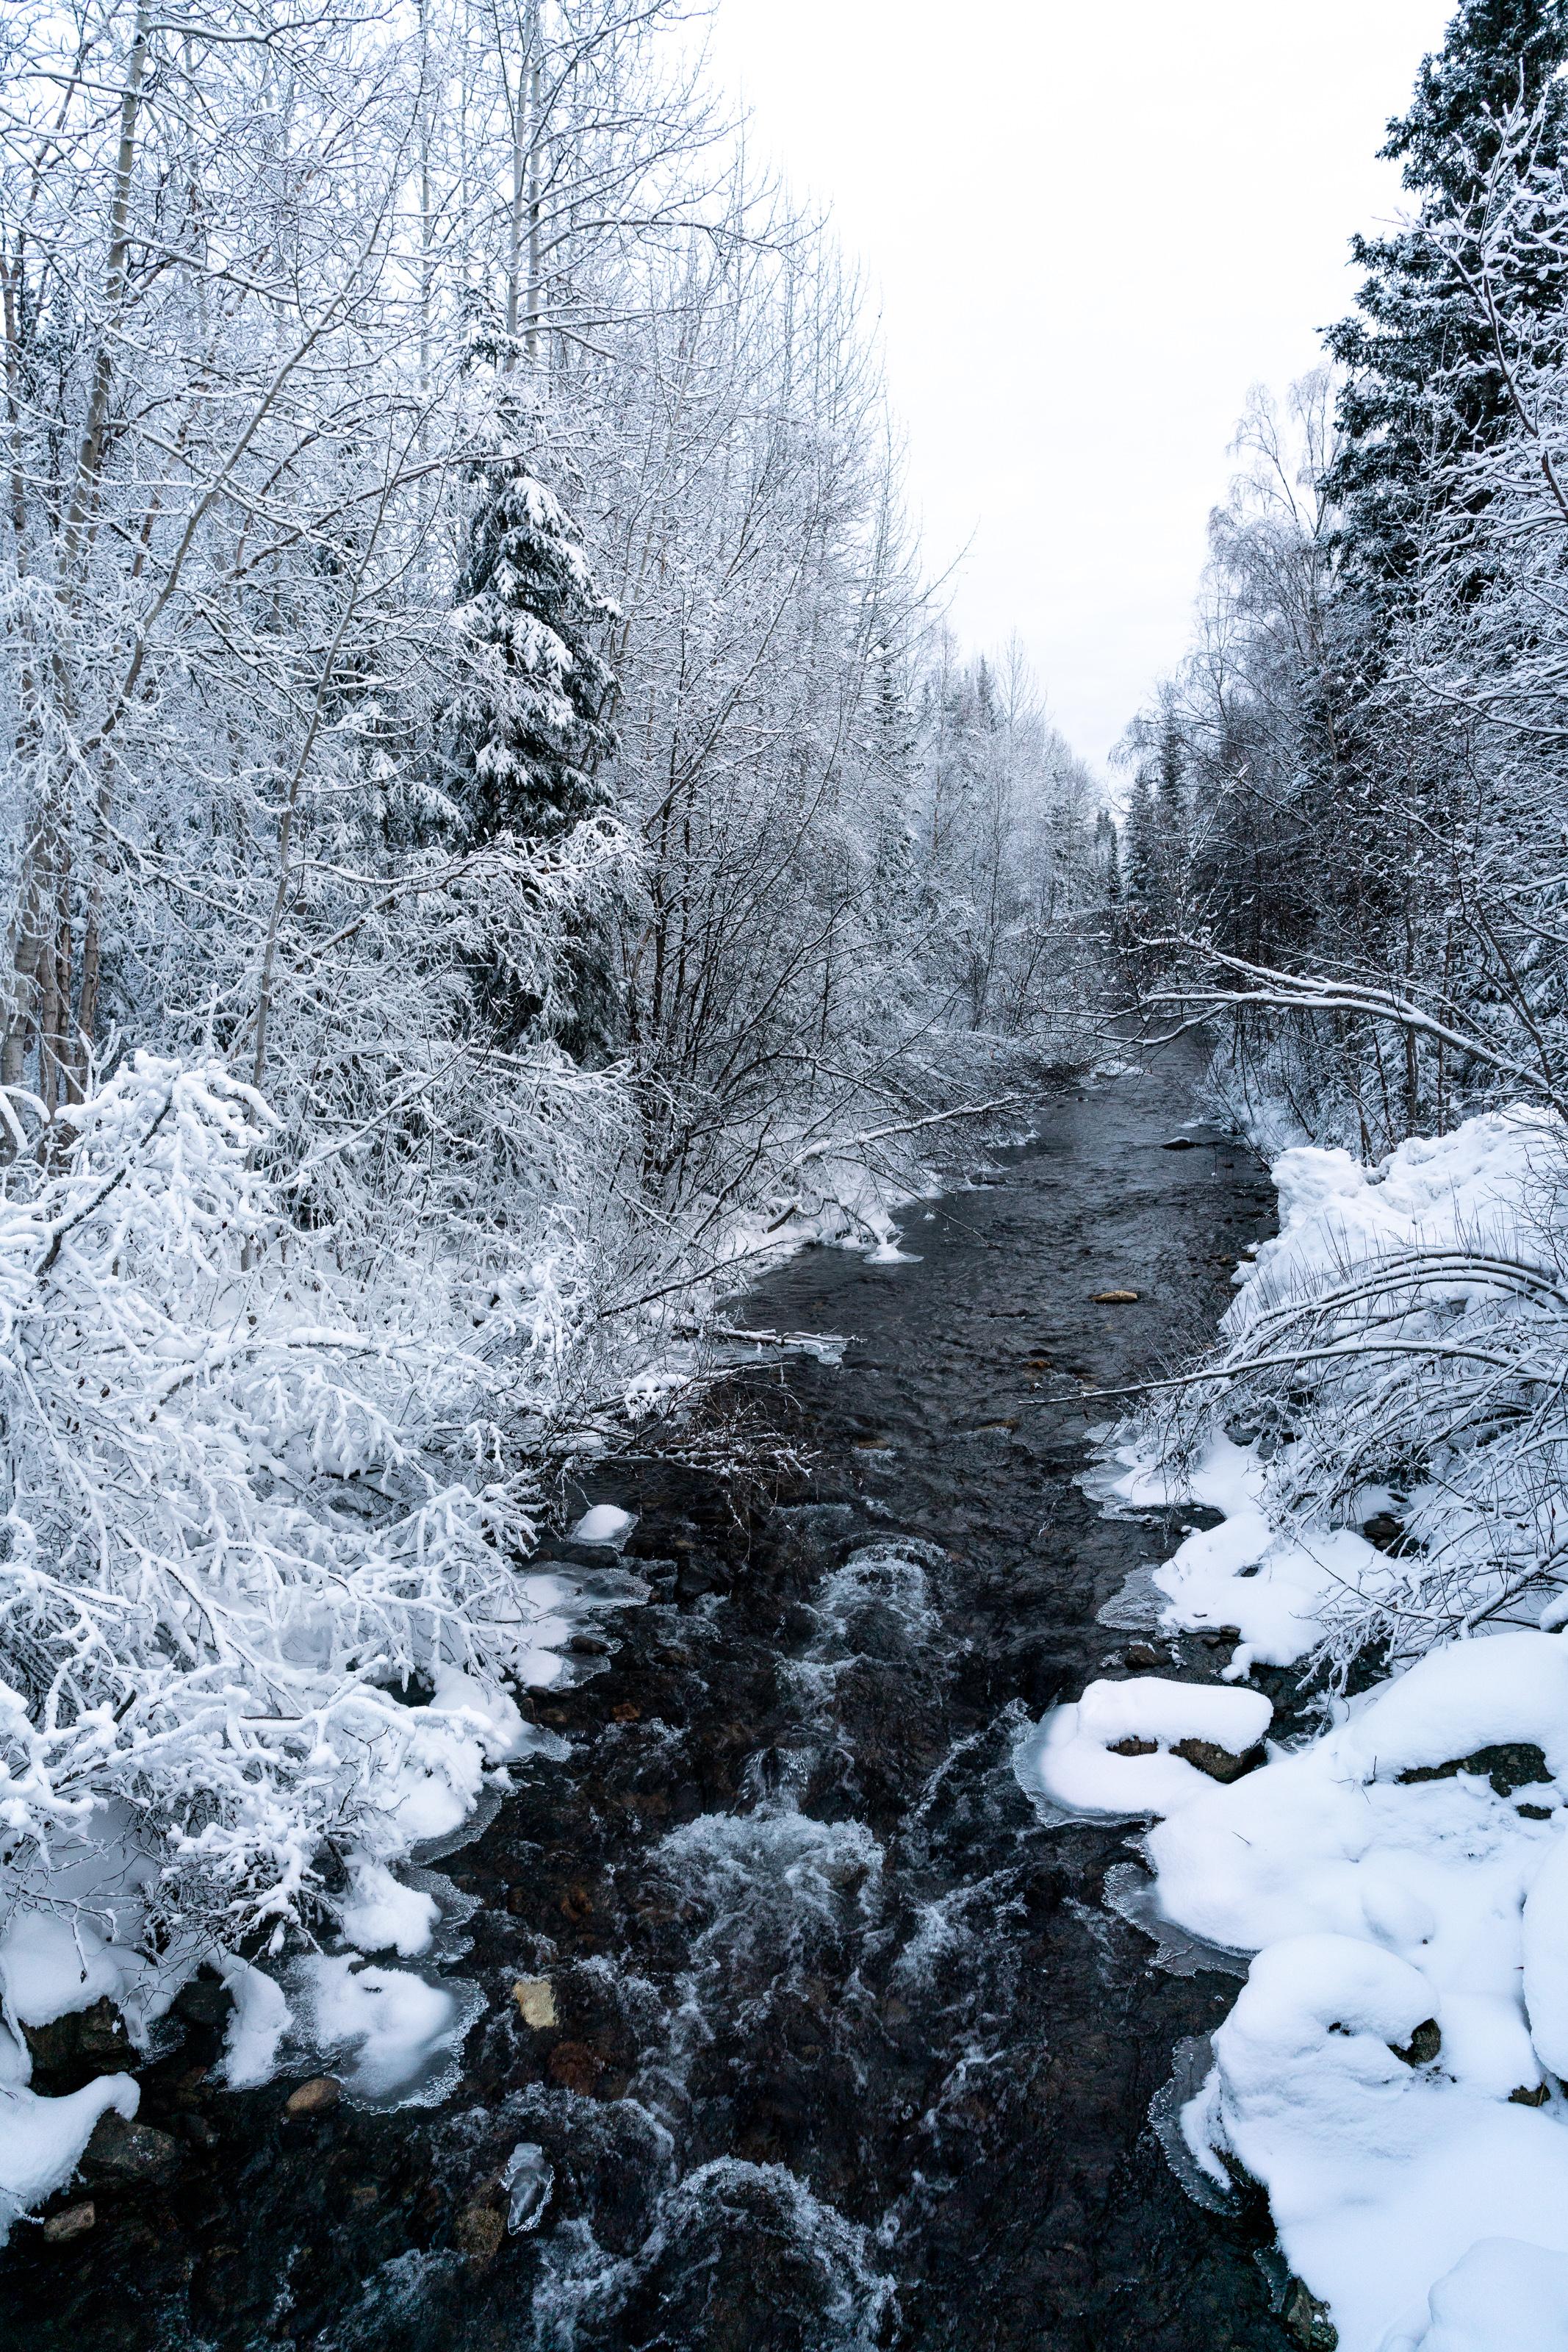 2018-12-06 Alaska McKay_20181206_AlaskaMcKay_T_A02295.jpg